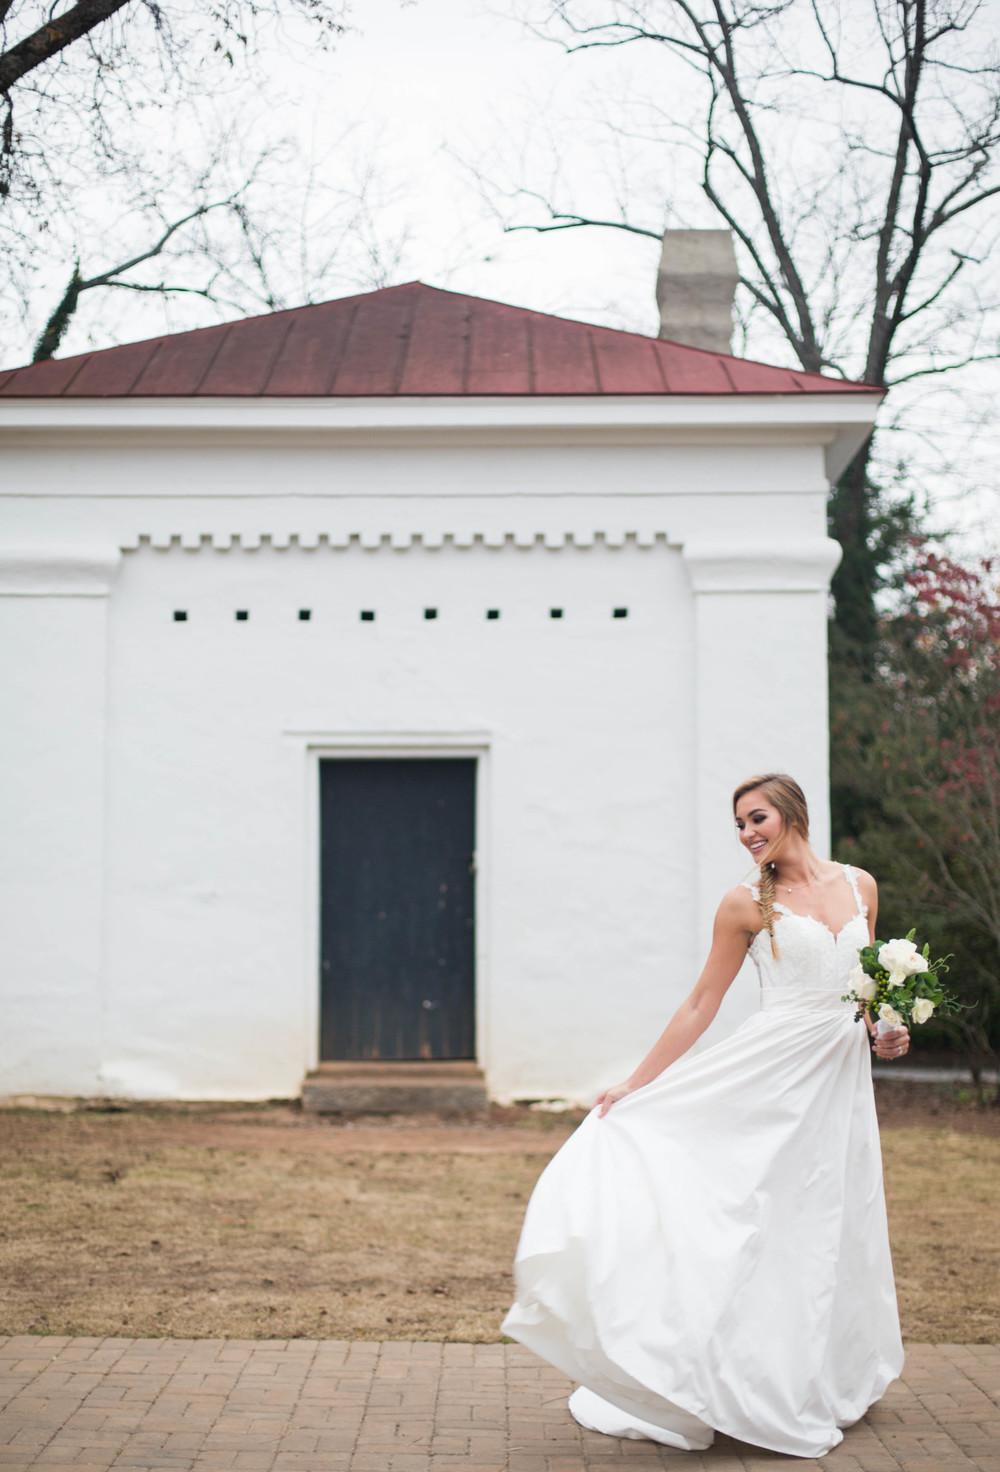 lauren bridal (112 of 123).jpg